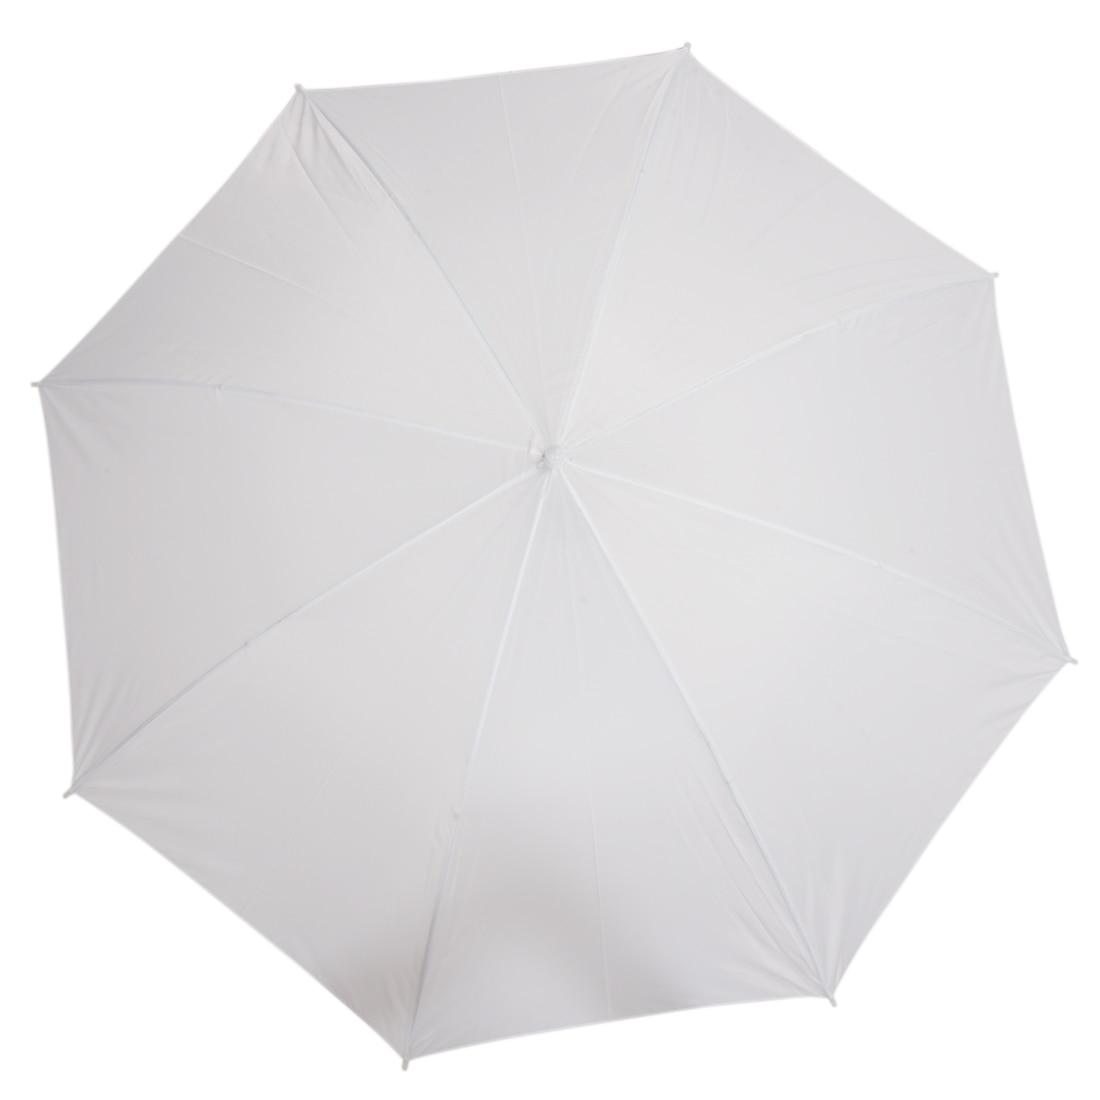 Brand New 40 inches / 103cm White Translucent Flash for Soft Umbrella or Photo Studio